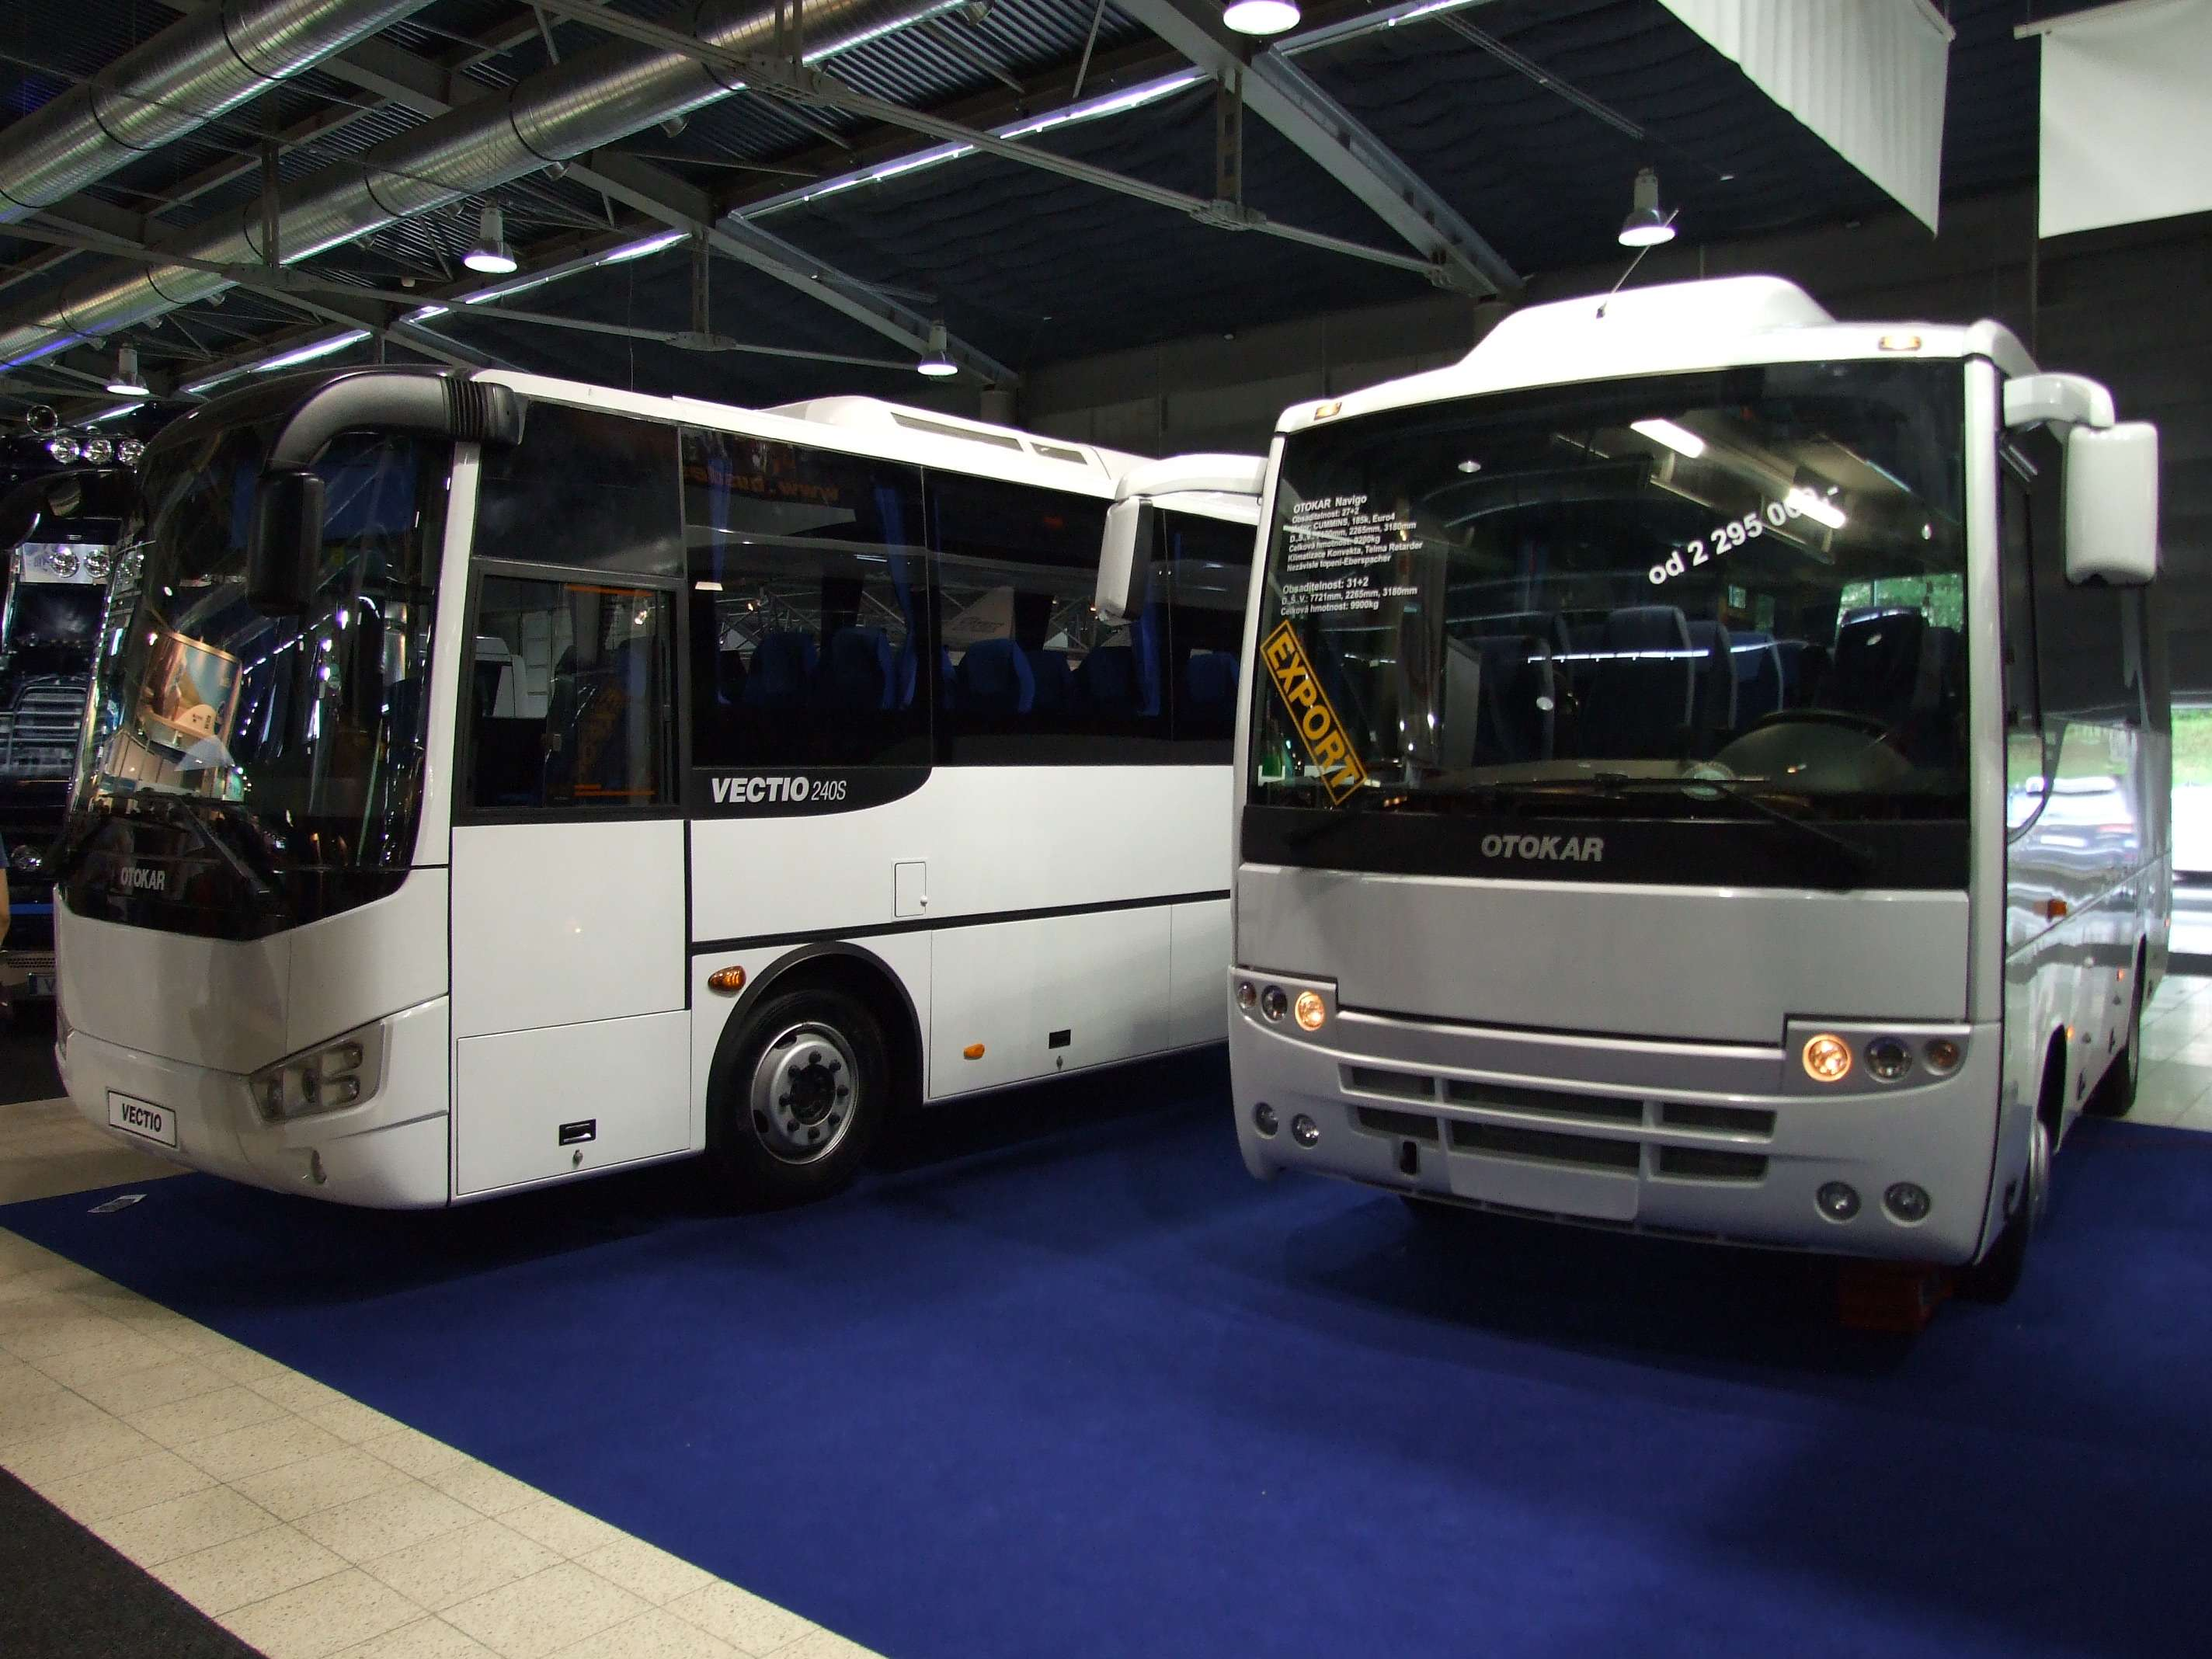 seller.az Avtobus icarəsi, otokar sifarişi